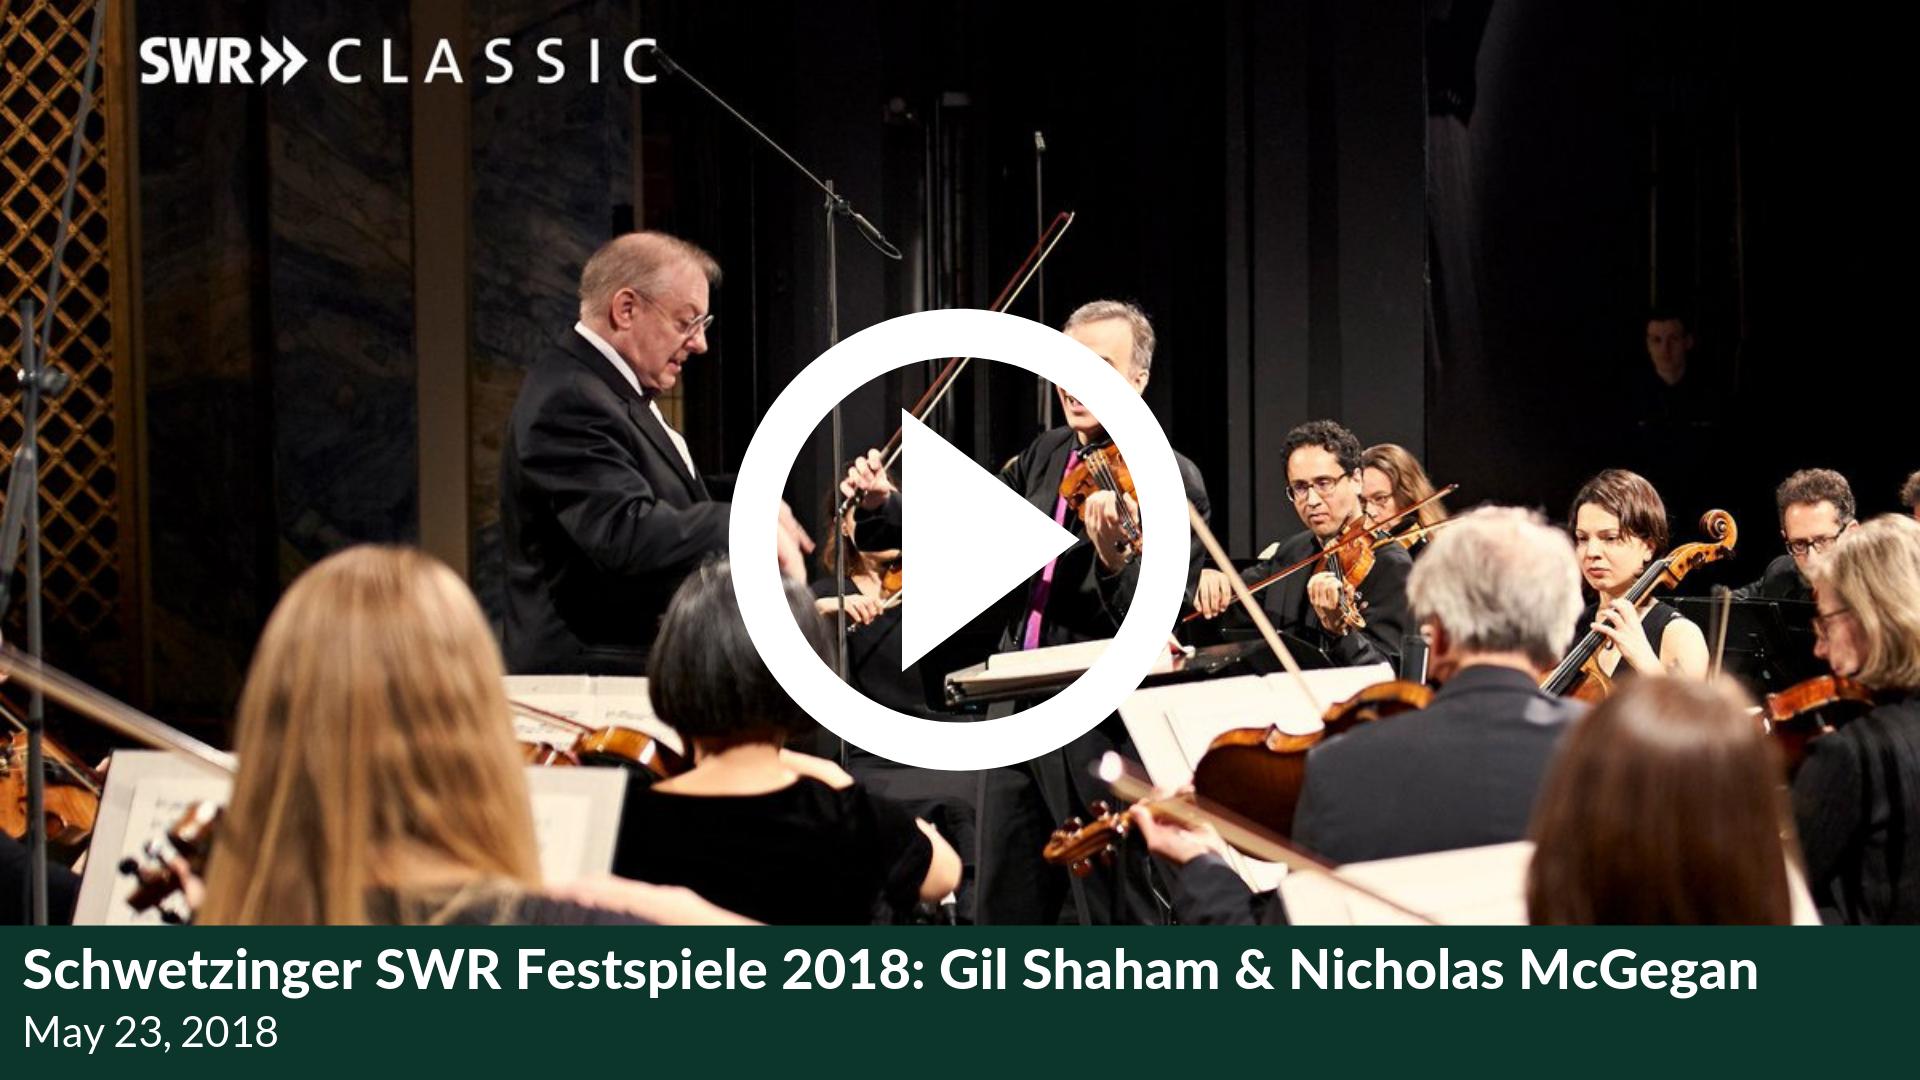 Schwetzinger SWR Festspiele 2018: Gil Shaham & Nicholas McGegan